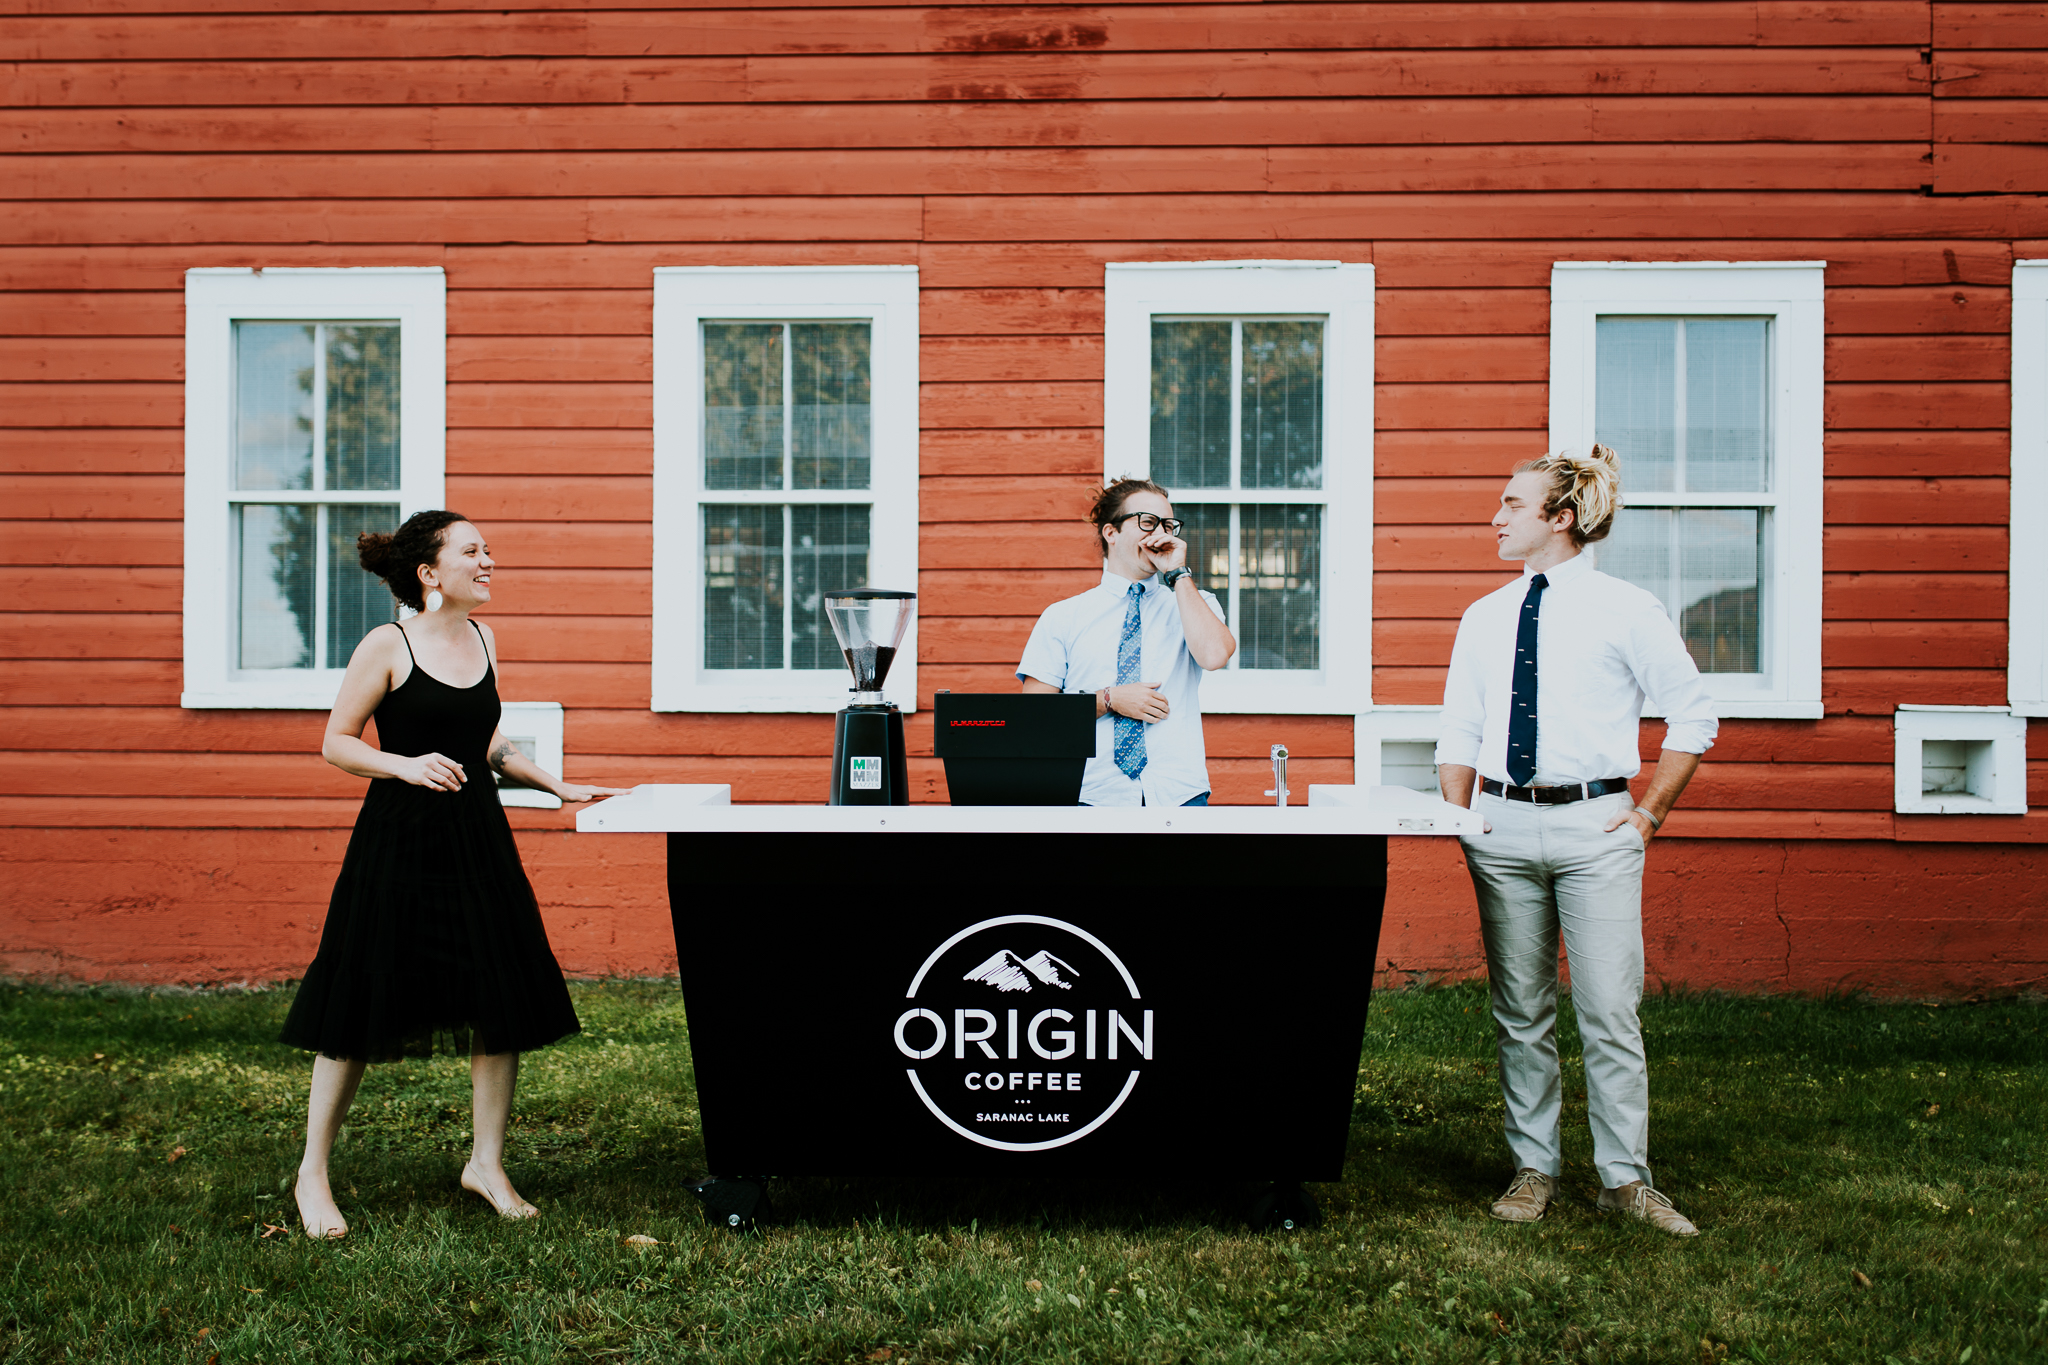 origincoffeecart-27.jpg